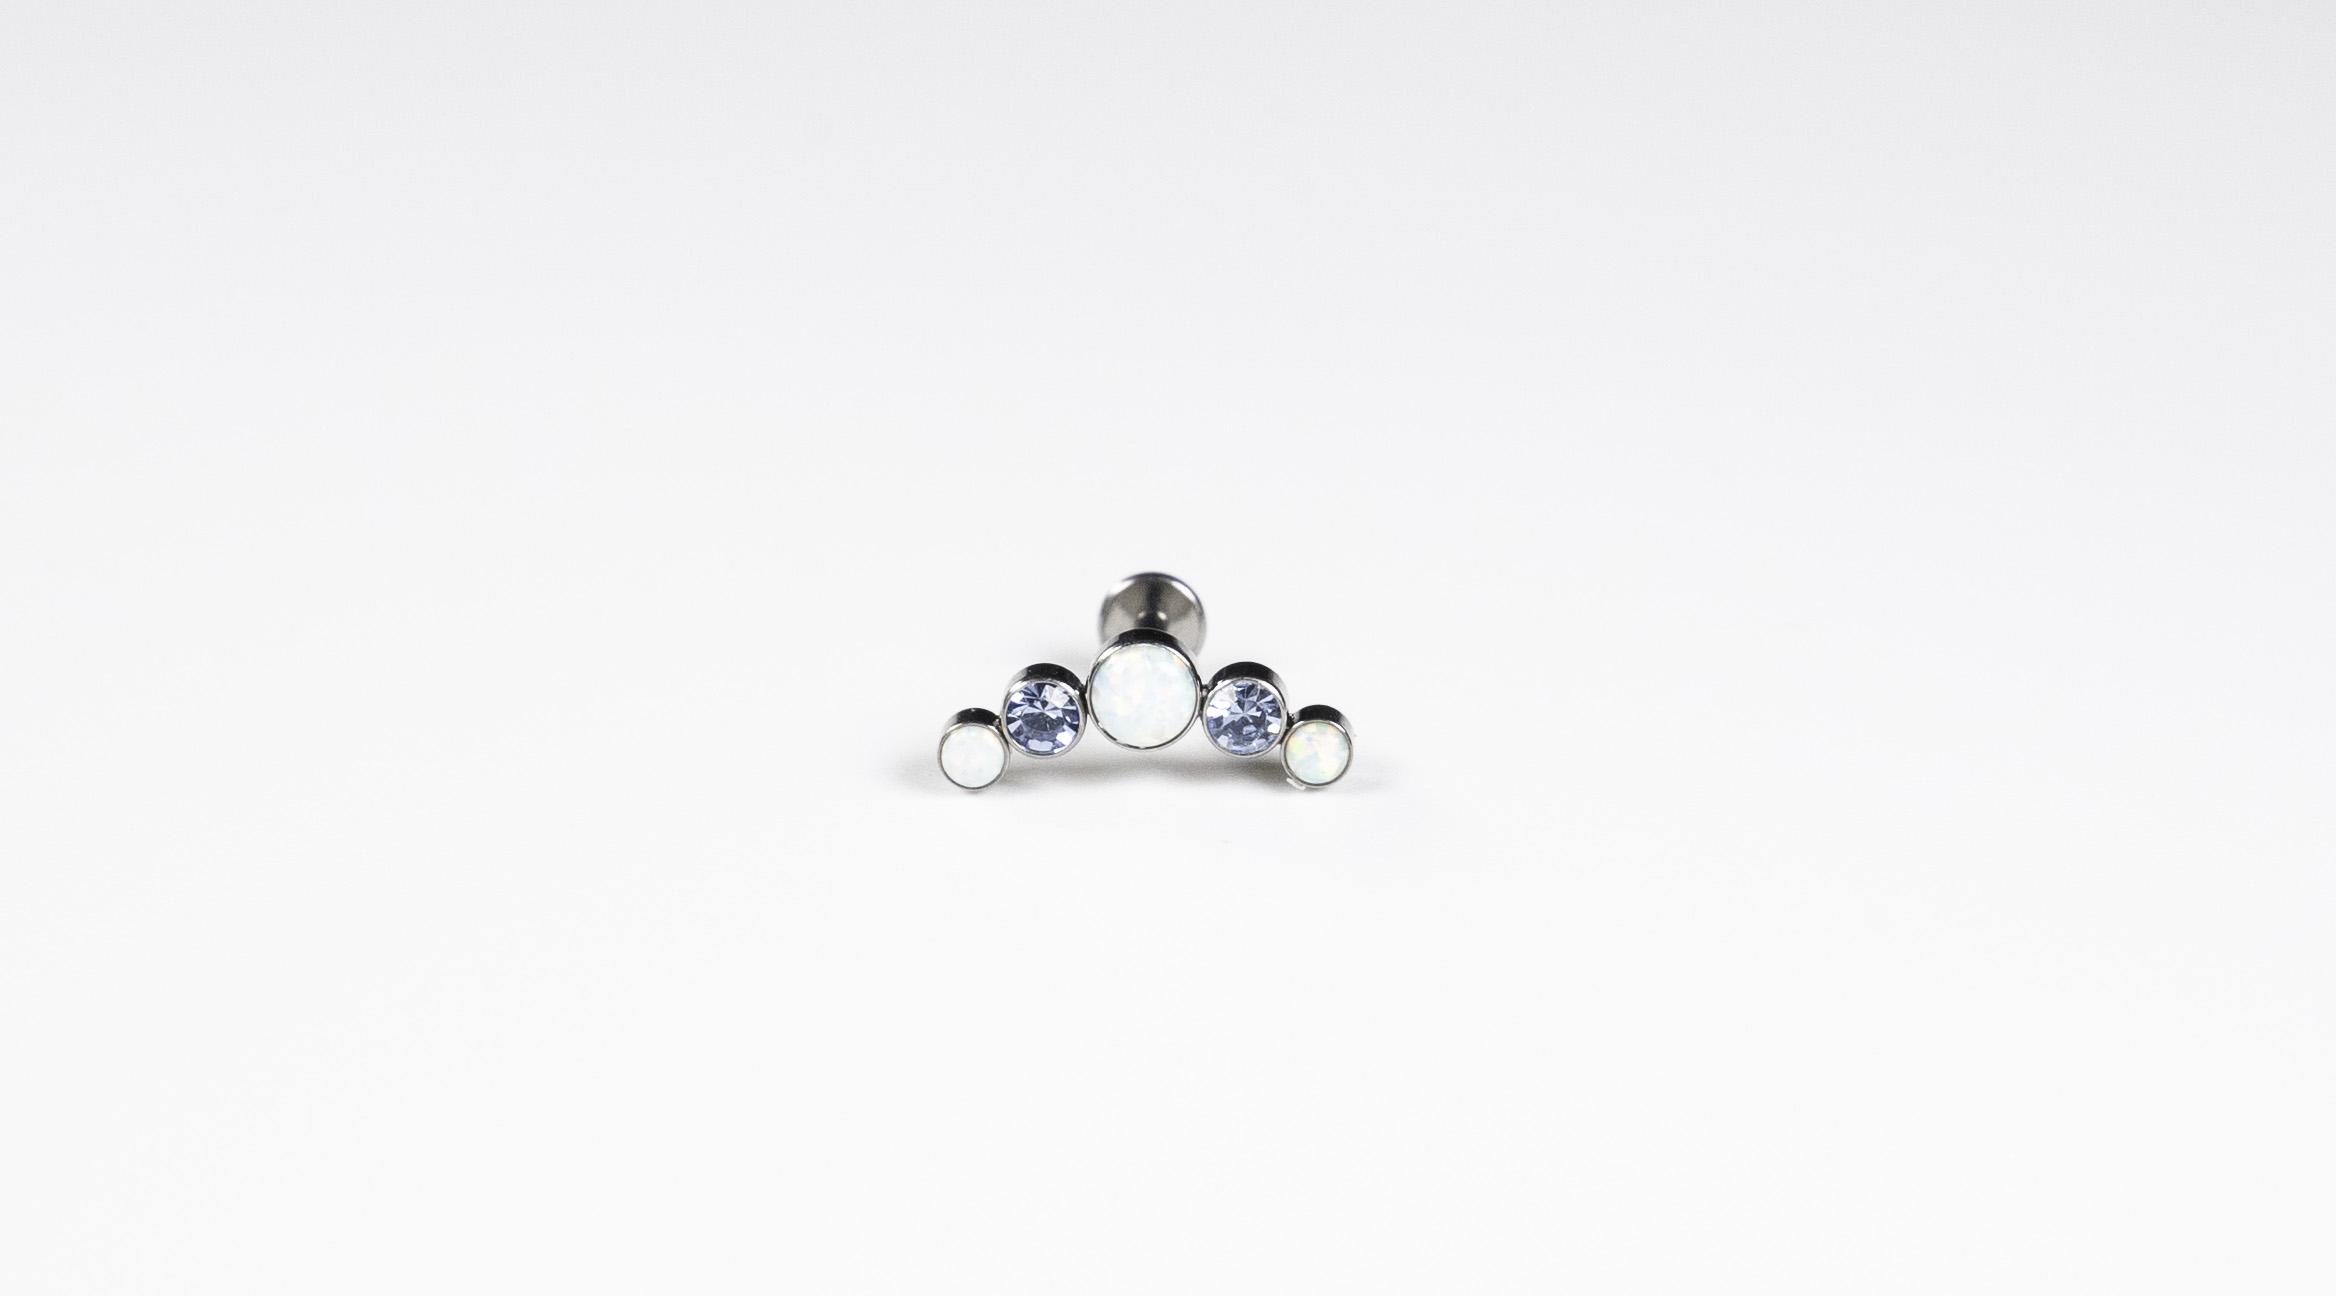 Titanium Curved Cluster Jewel - Bella Andrea London Piercing Jewellery